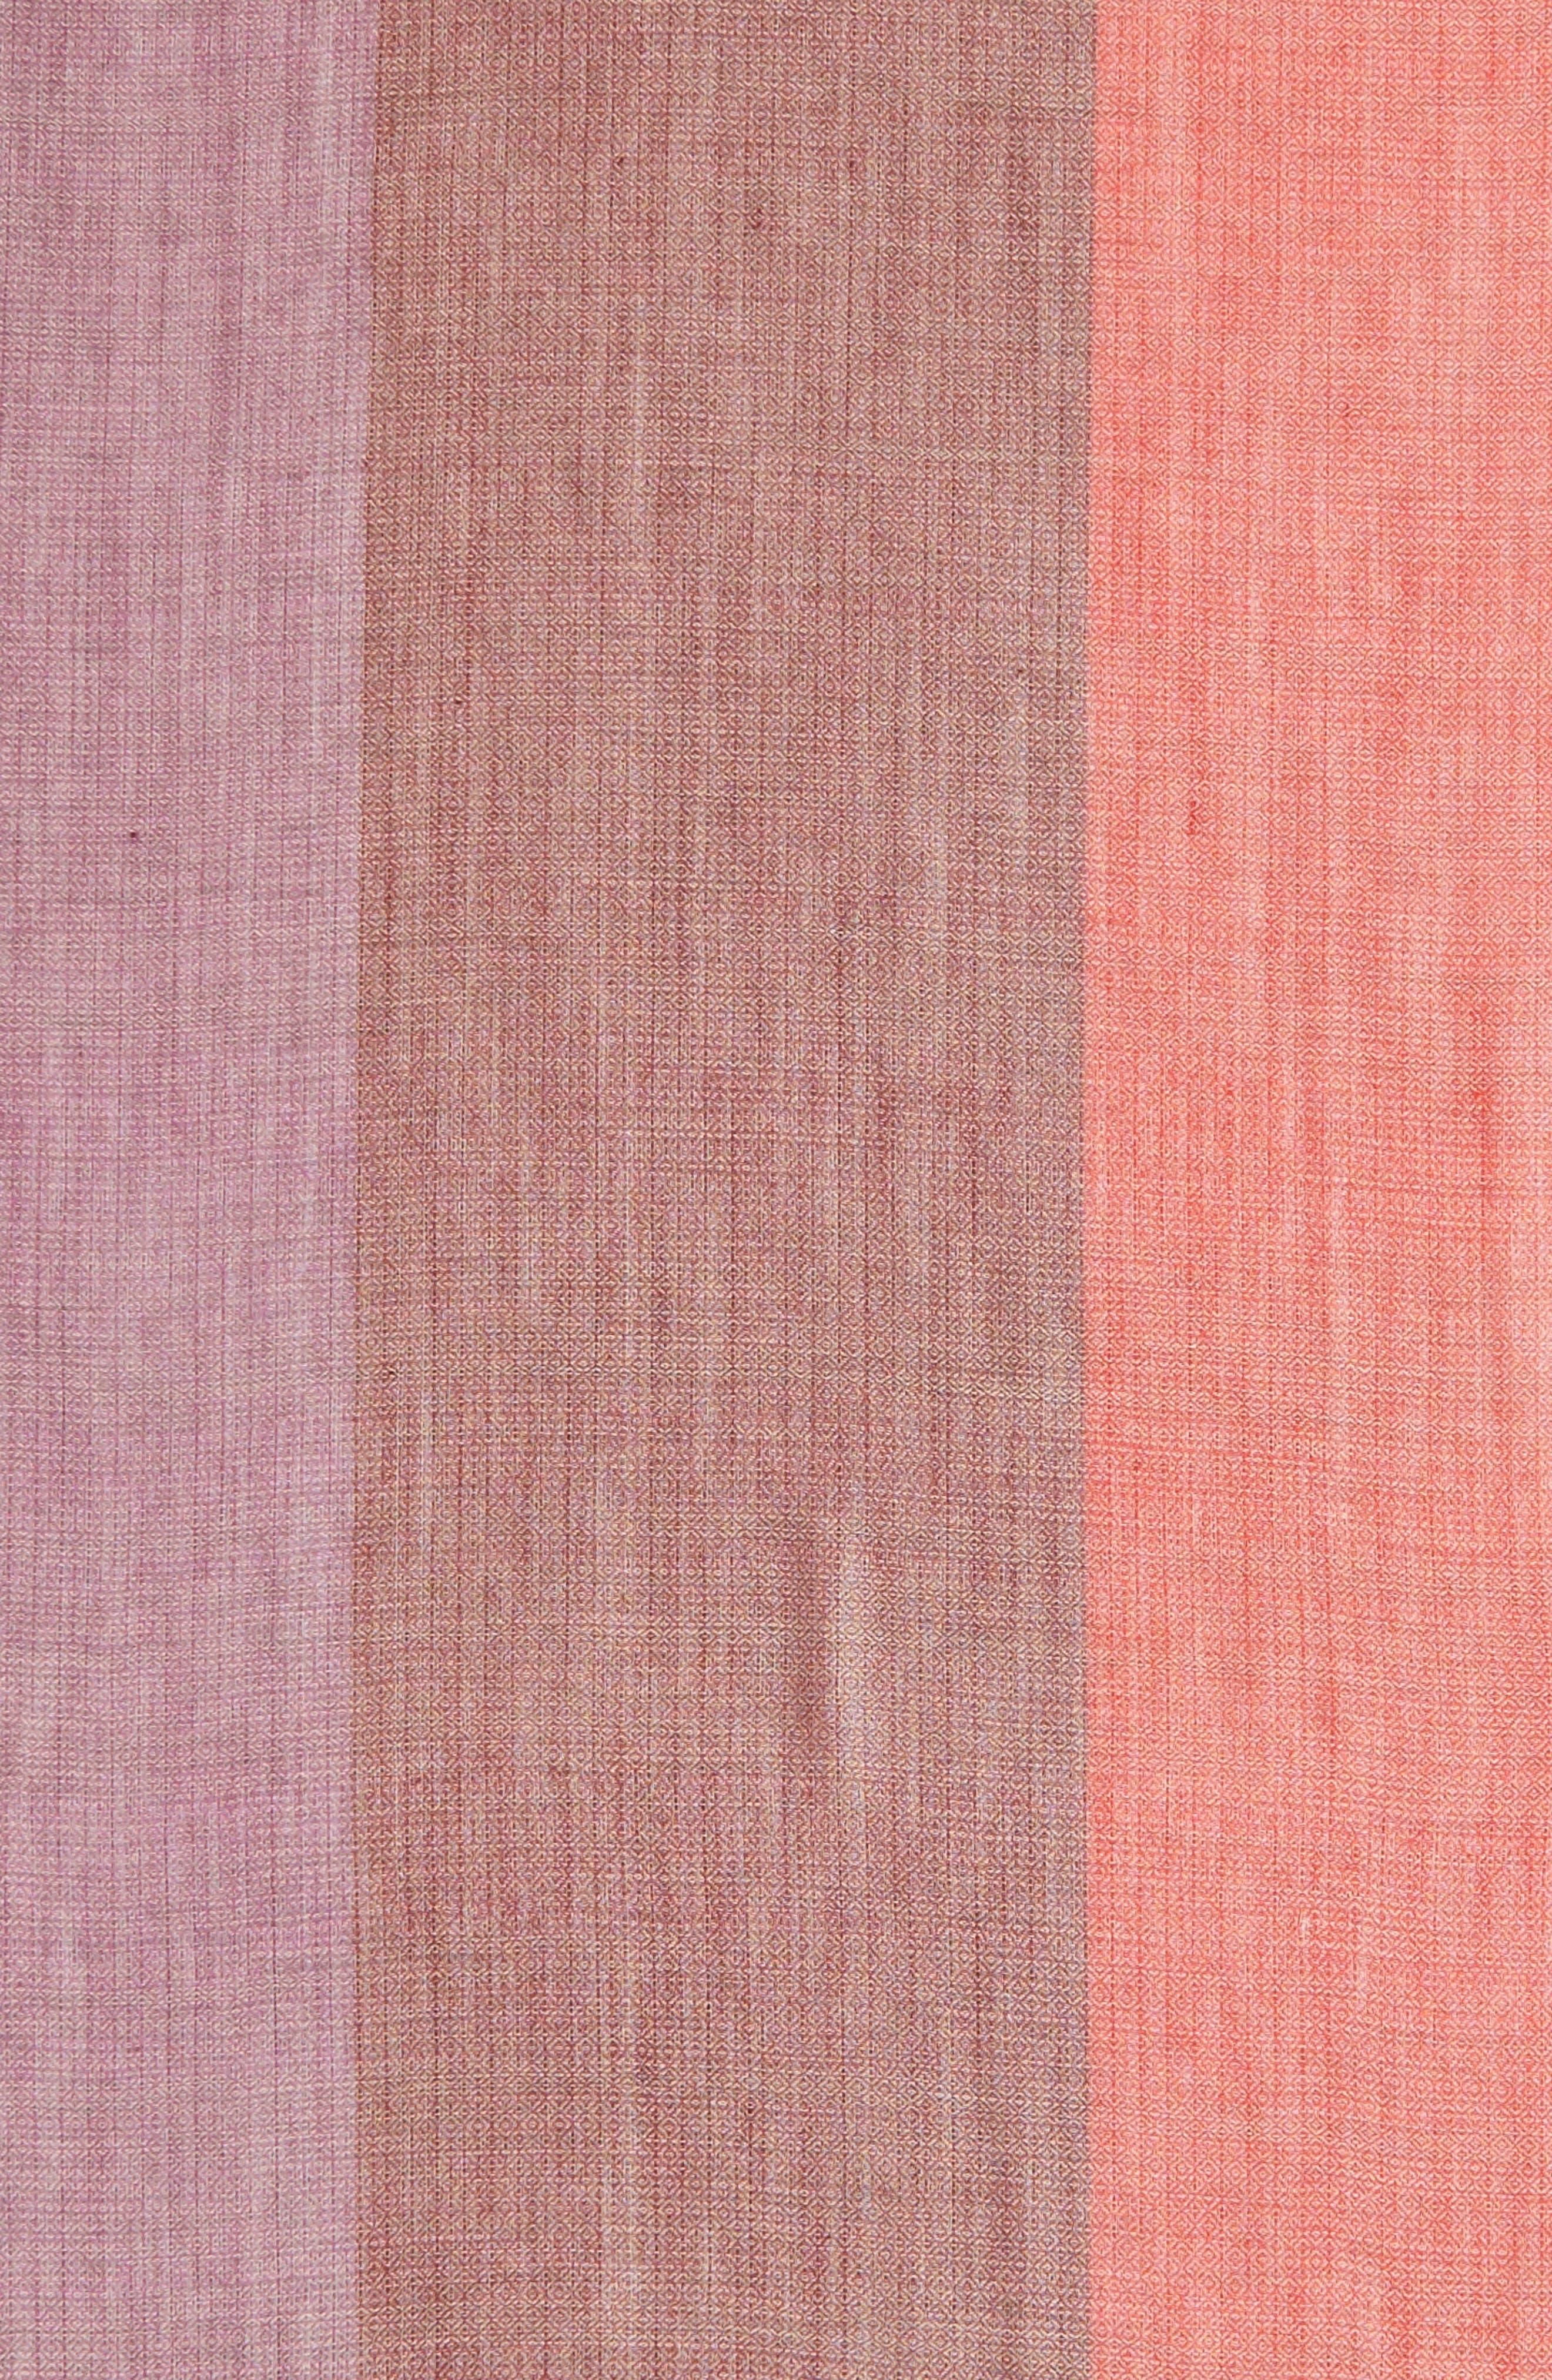 Colorblock Wool & Silk Scarf,                             Alternate thumbnail 11, color,